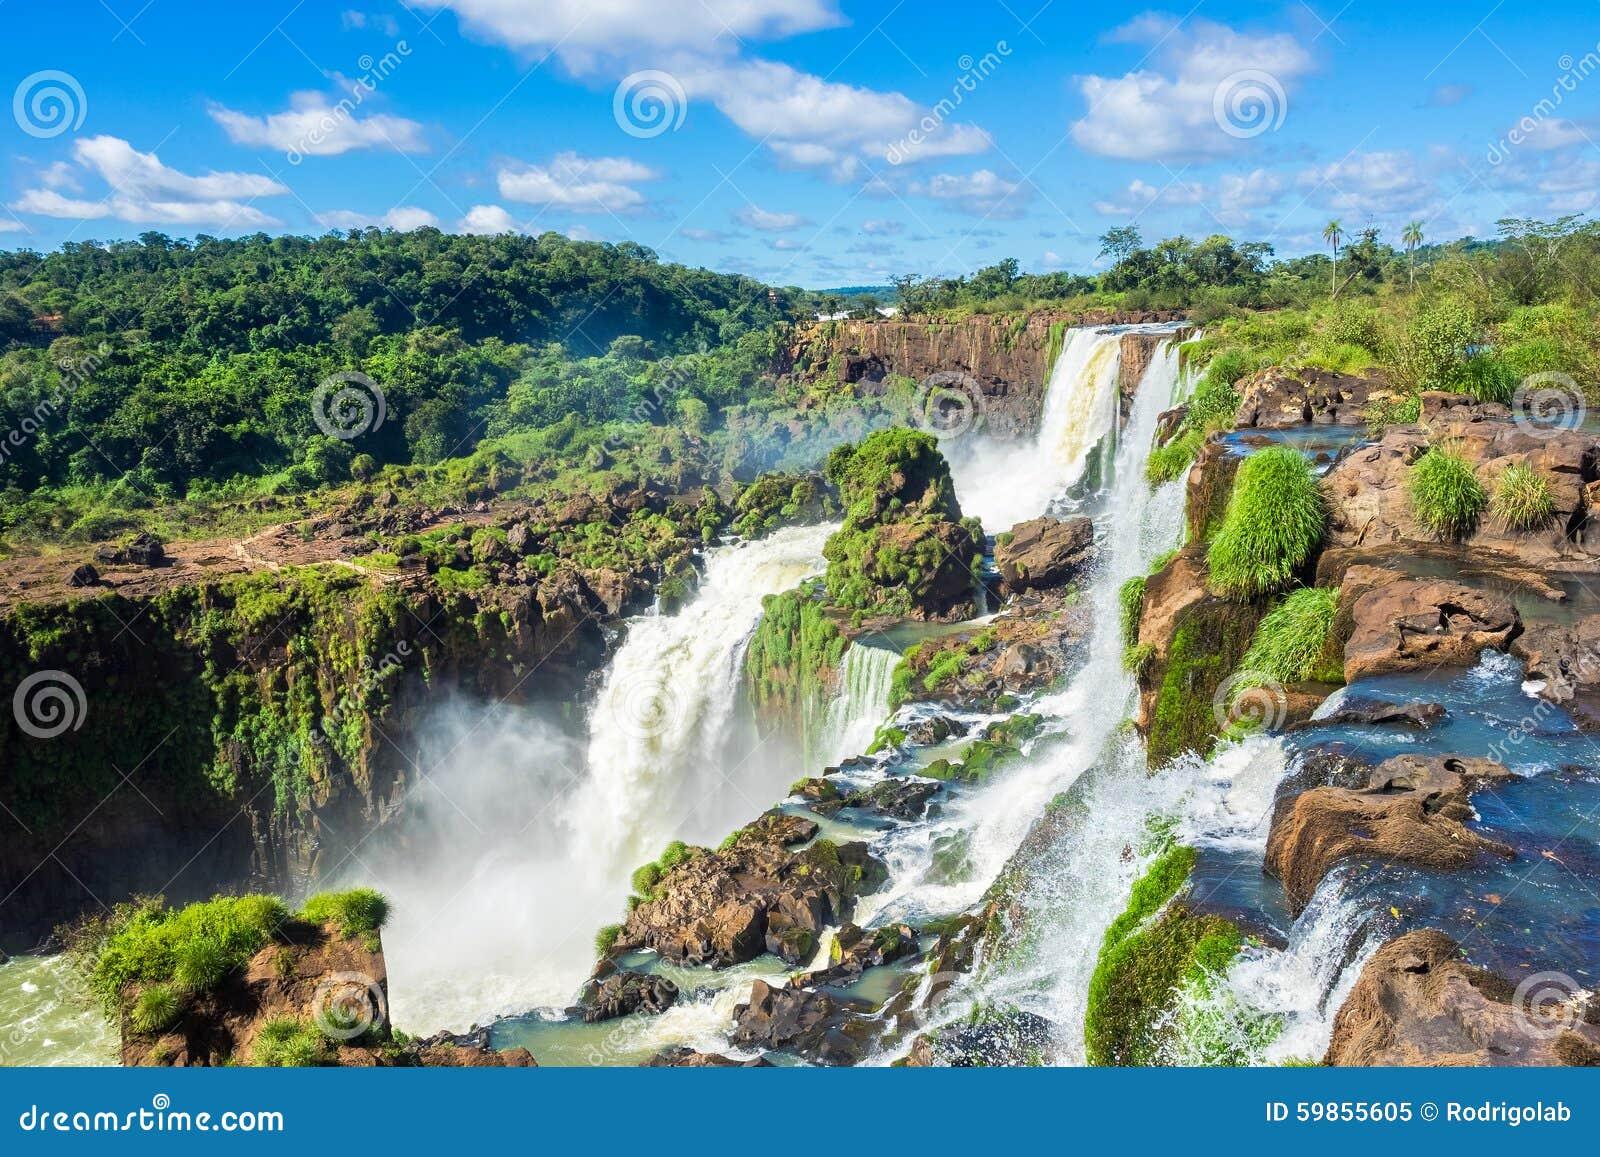 Iguazu Falls, on the Border of Argentina, Brazil, and Paraguay